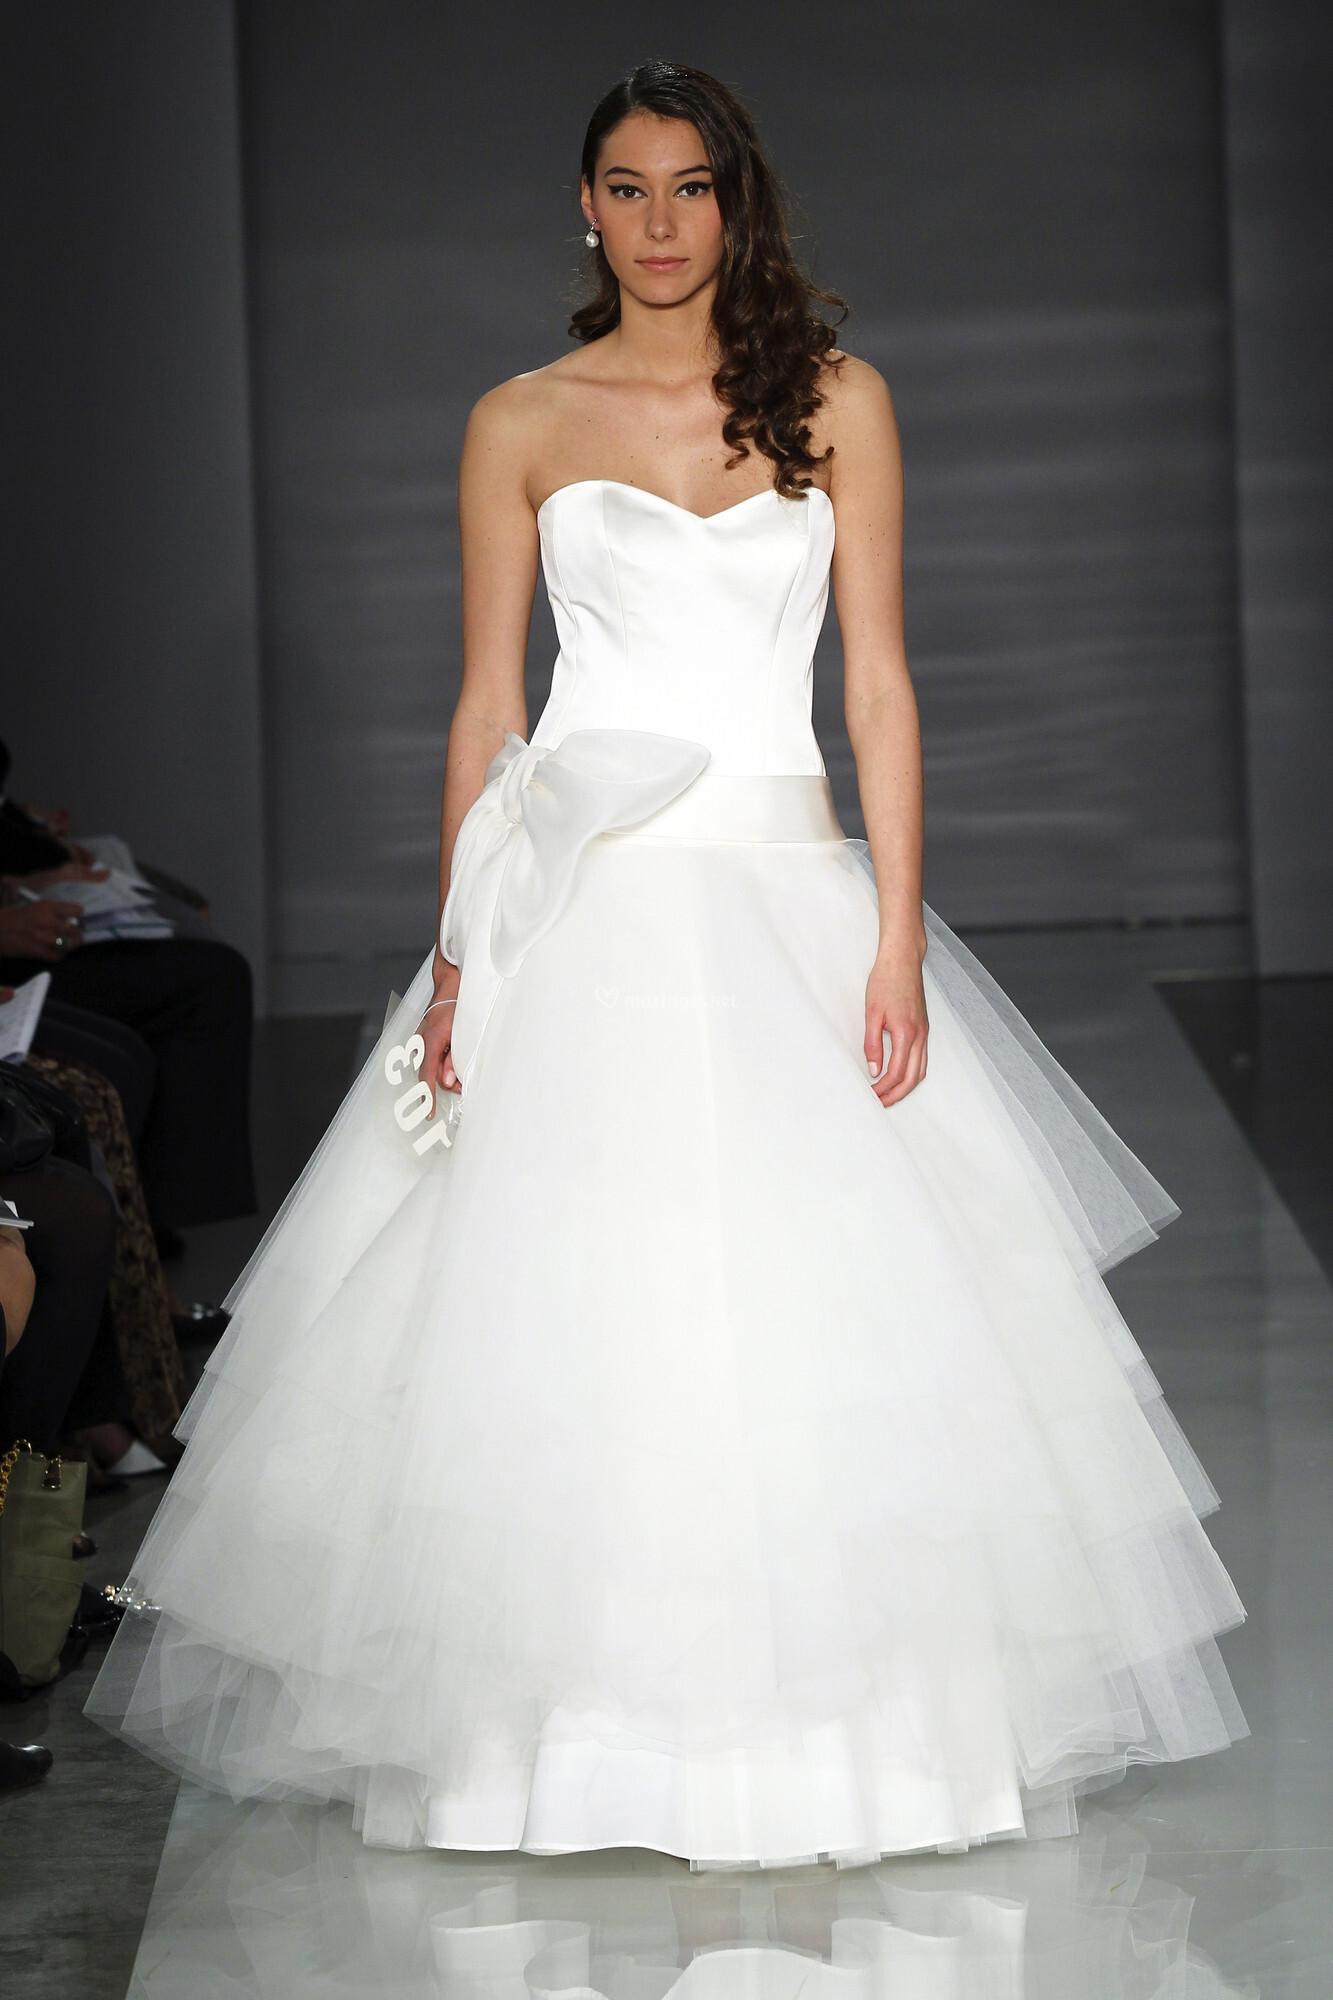 HEROLINDA - Robes de mariée - Cymbeline - Mariages.net